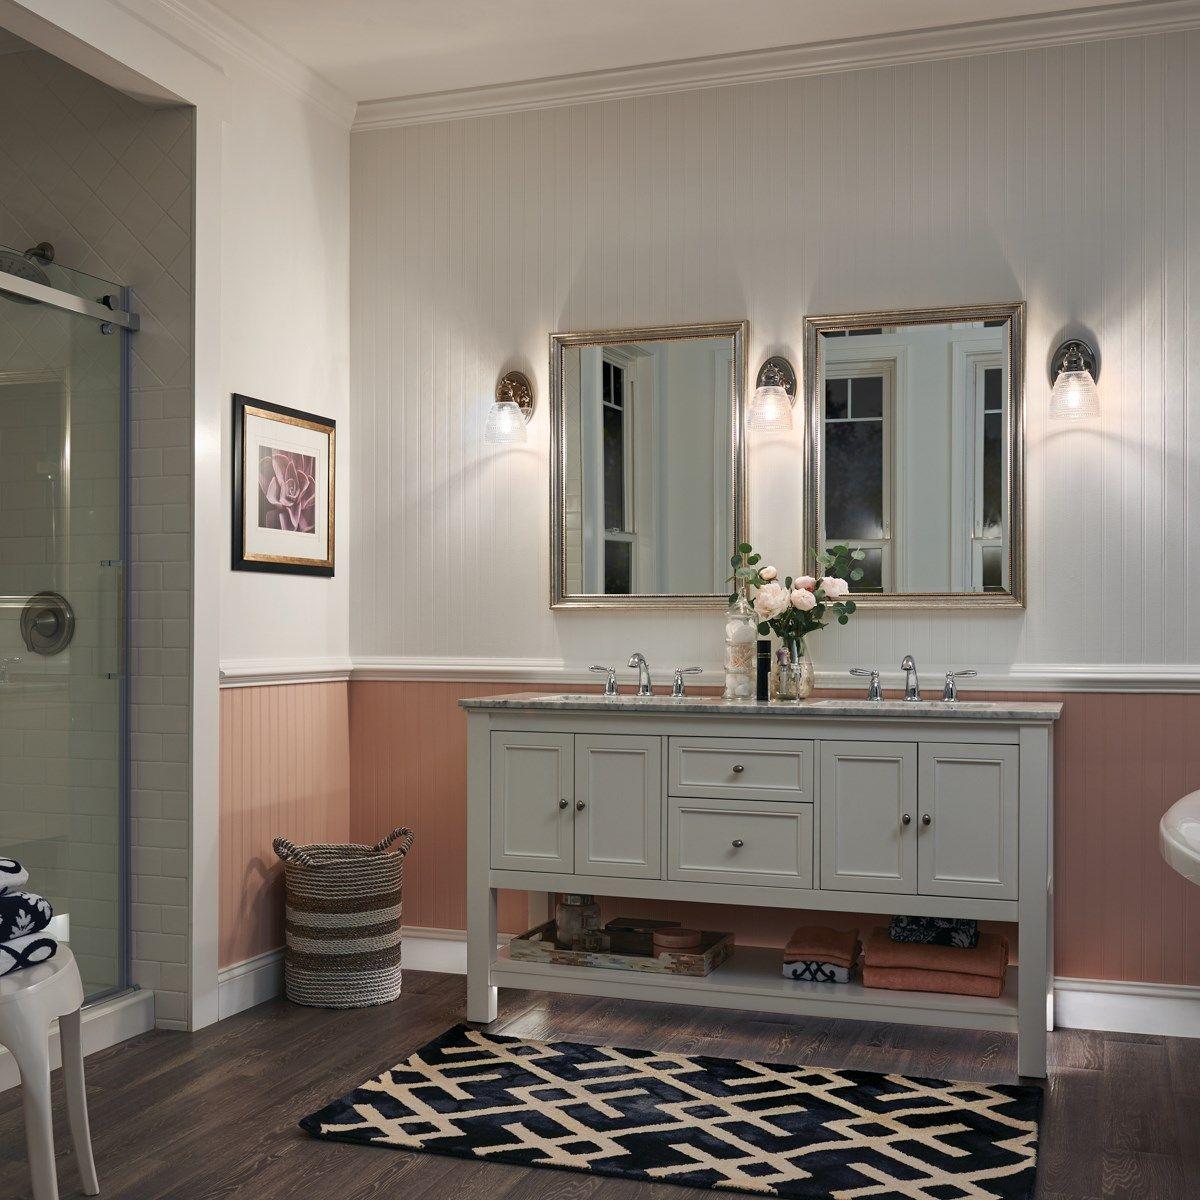 Karmarie 1 Light Wall Sconce Olde Bronze Kichler Lighting Wall Sconce Lighting Bathroom Sconce Lighting Bathroom Lighting